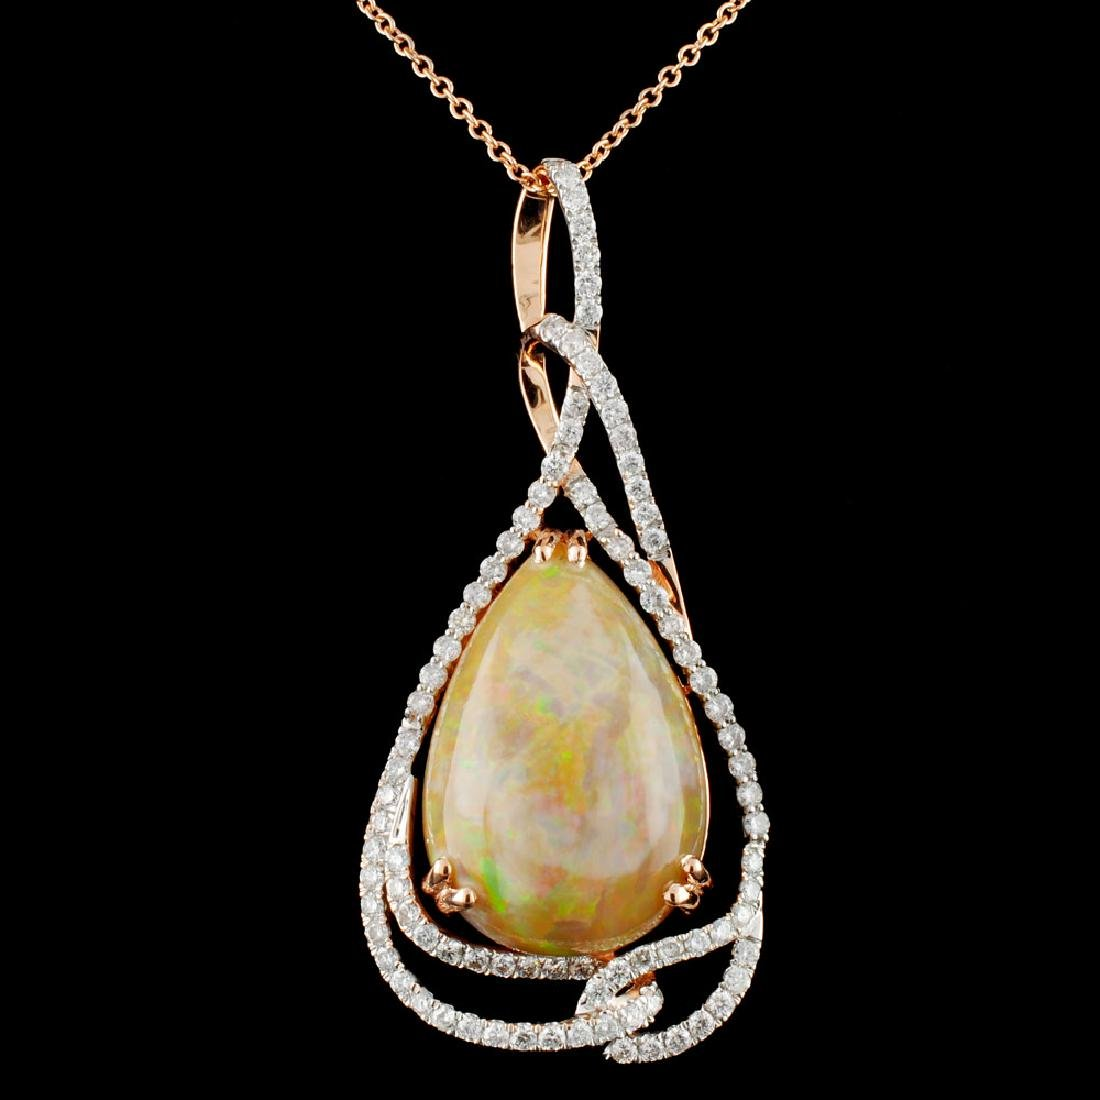 14K Gold 14.32ct Opal & 1.20ctw Diamond Pendant